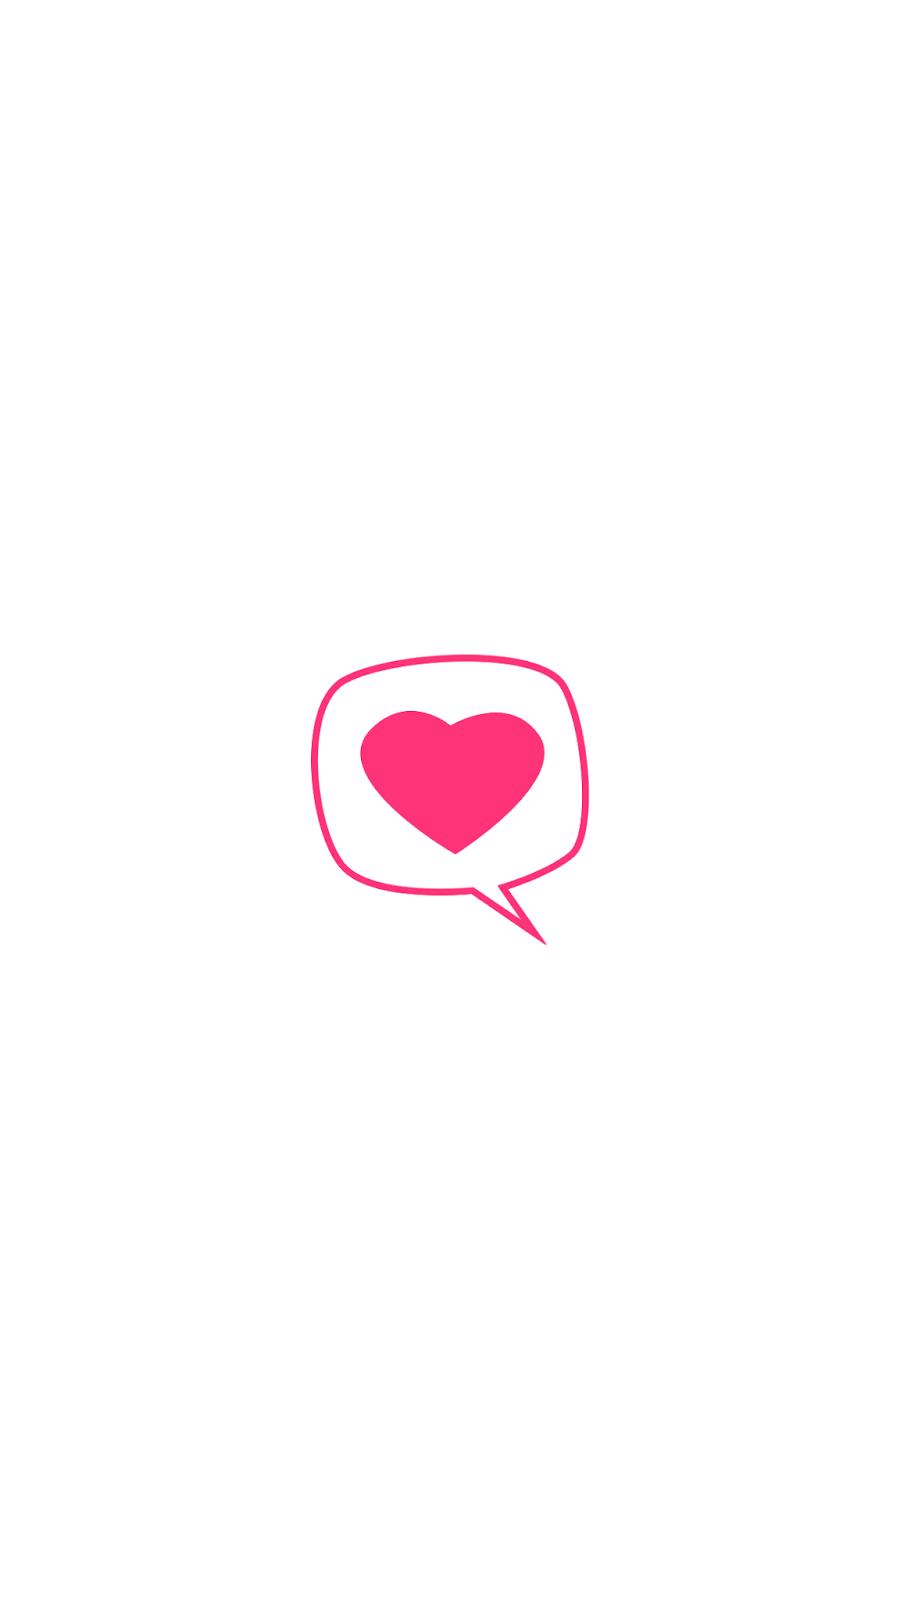 Wallpaper Background Hd Iphone Heart Pink Simple Papeis De Parede Fofos Para Celular Papeis De Parede Papel De Parede Celular